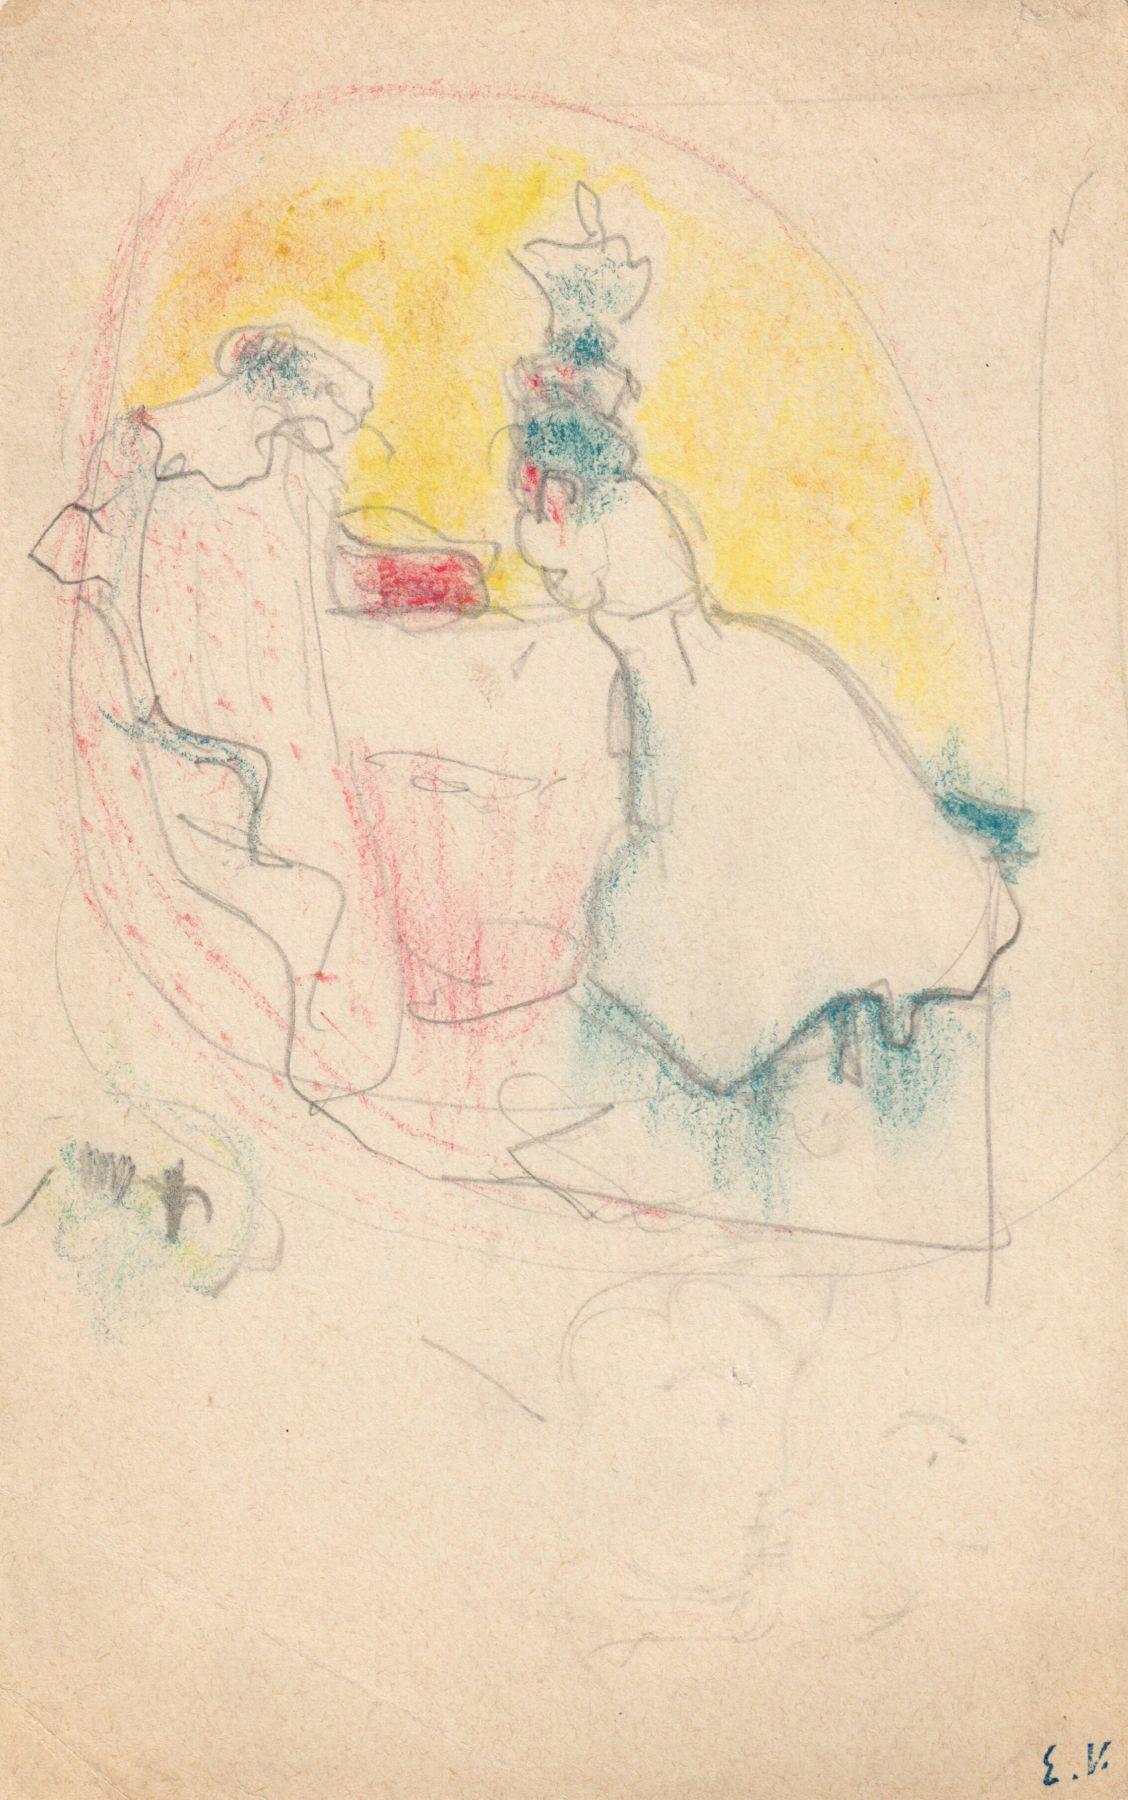 "Edouard Vuillard, Study for ""Les deux belles-soeurs,"" 1898-1899, Colored pencils and graphite on paper 6 1/8 x 3 7/8 inches"